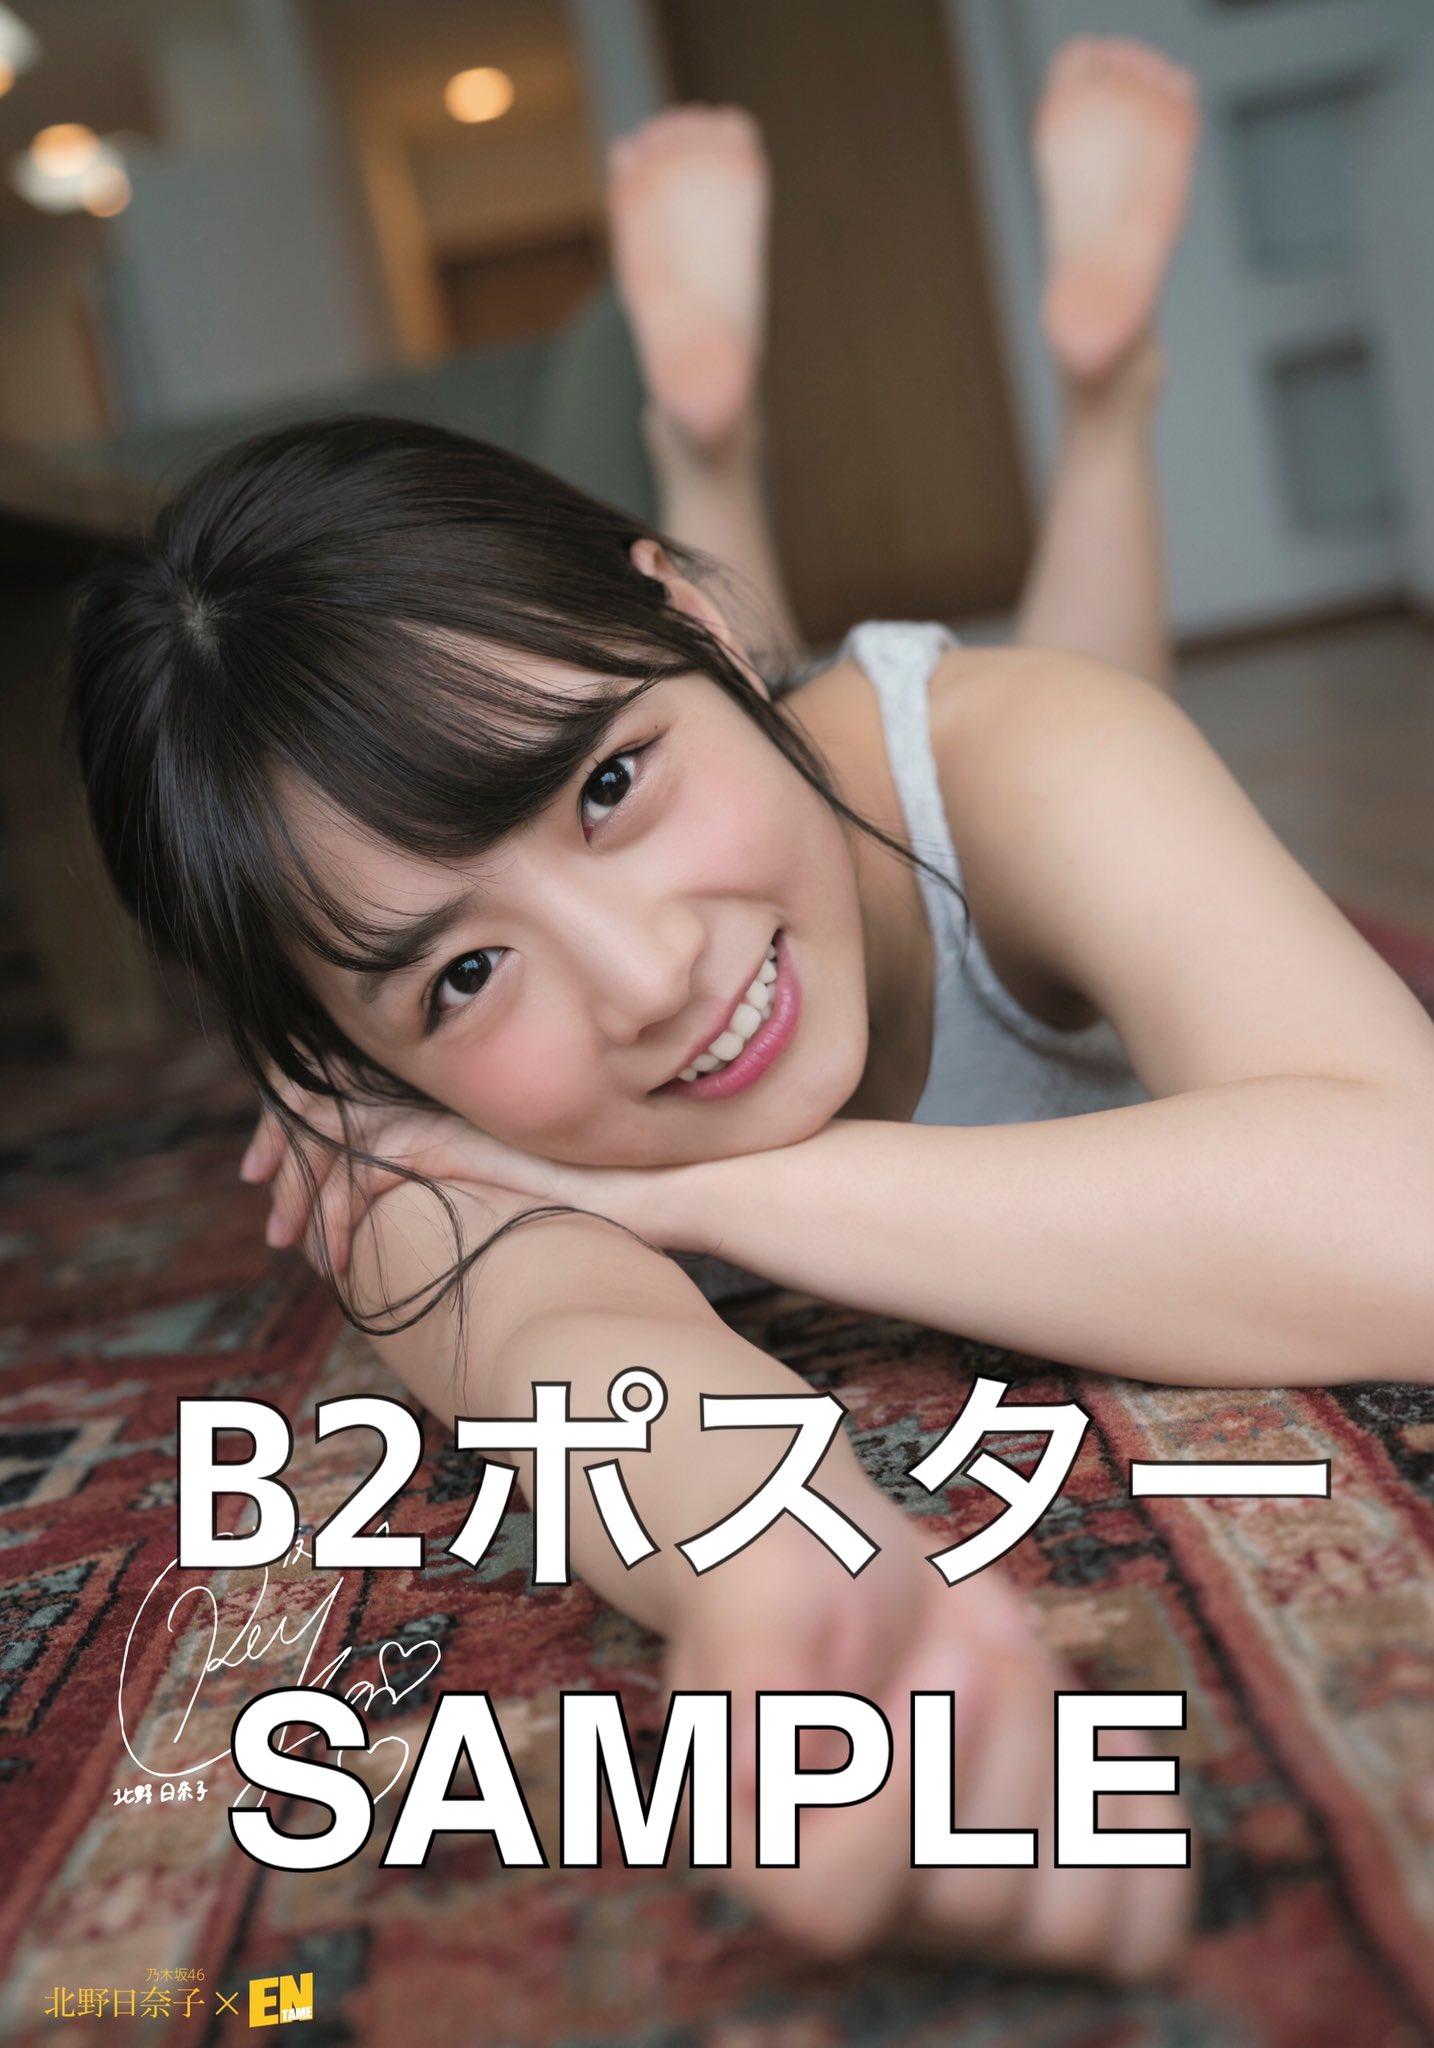 ENTAME(エンタメ) 2019年7月号 特大B2両面ポスター 北野日奈子